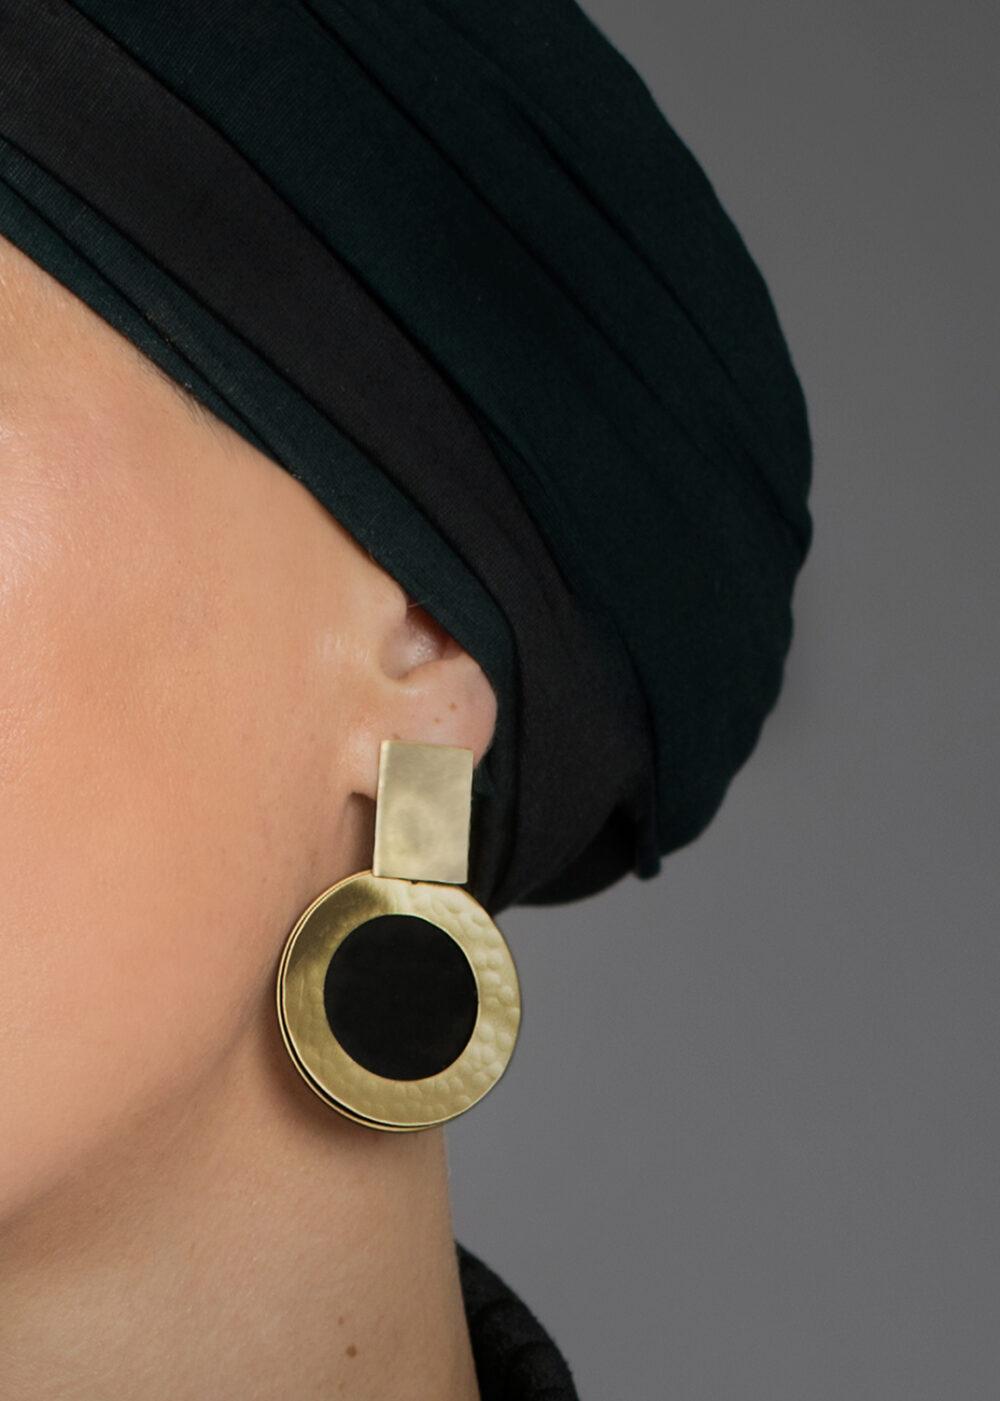 Hestia-Ohrringe-gold-schwarz-Model-Detail